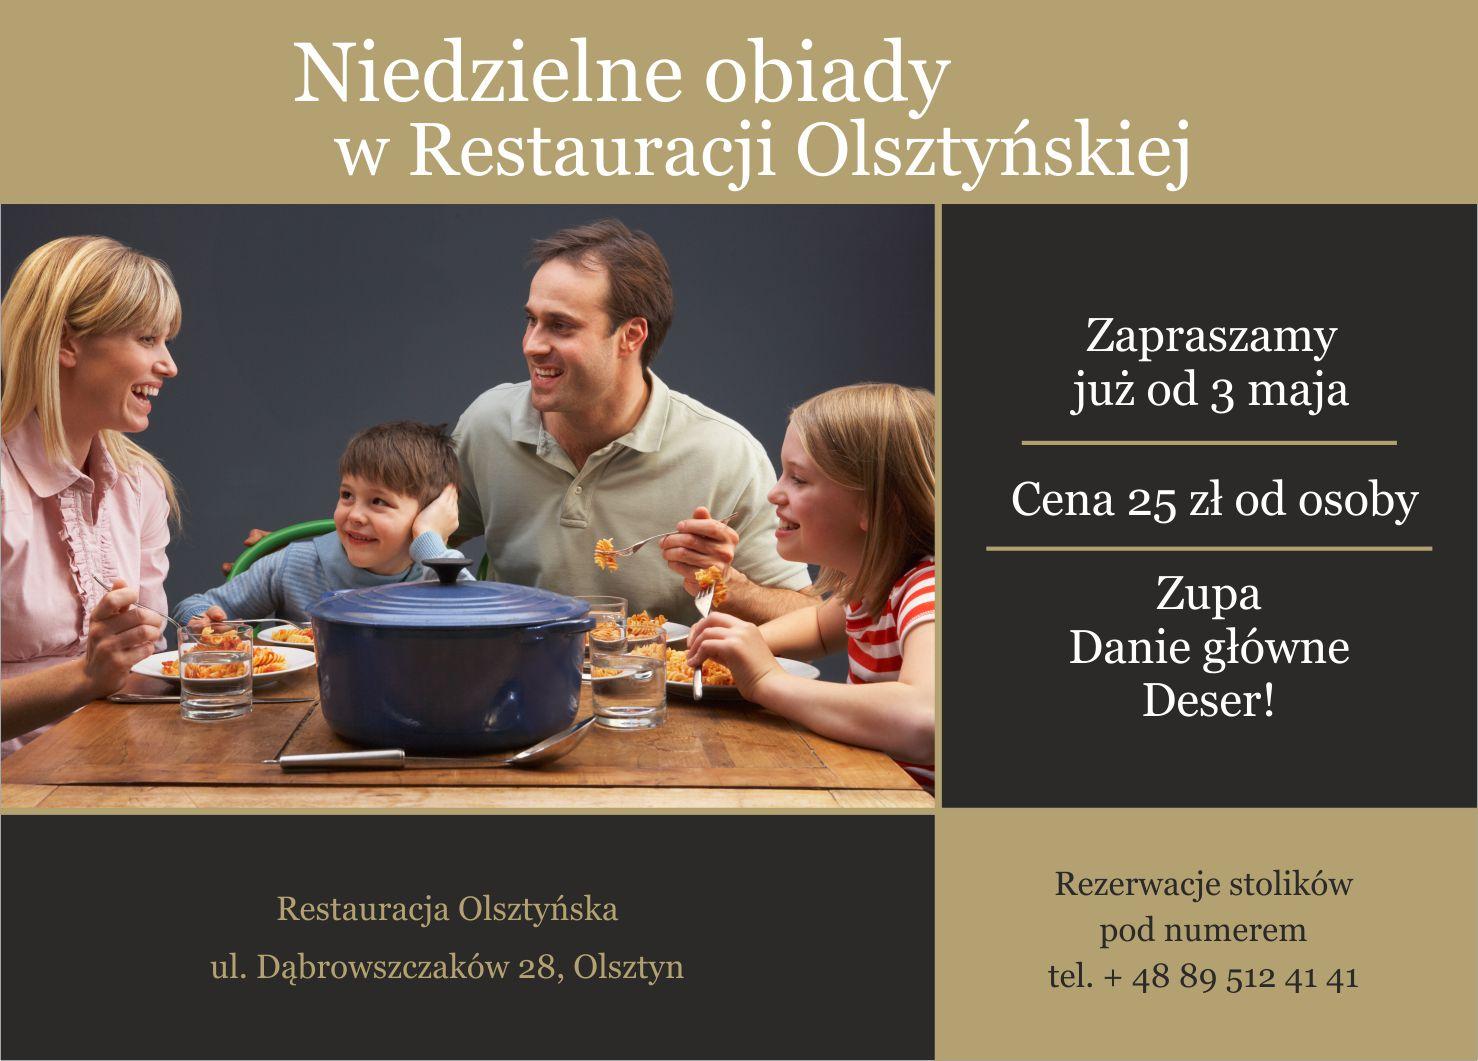 Dyplomat obiady 250 x 179,4, pogląd